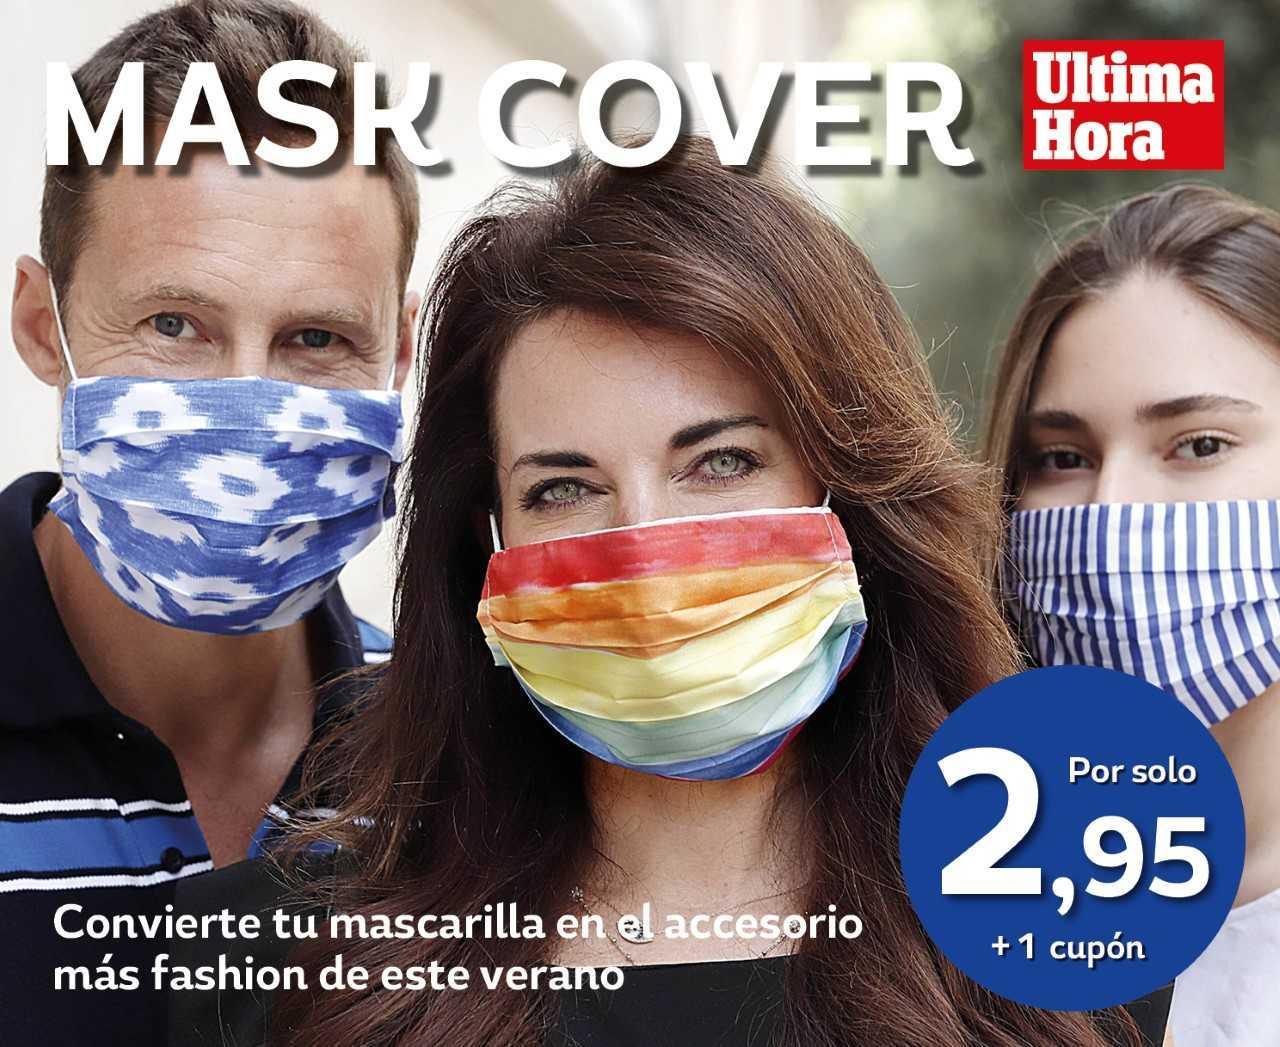 Originales Mask Cover con Ultima Hora